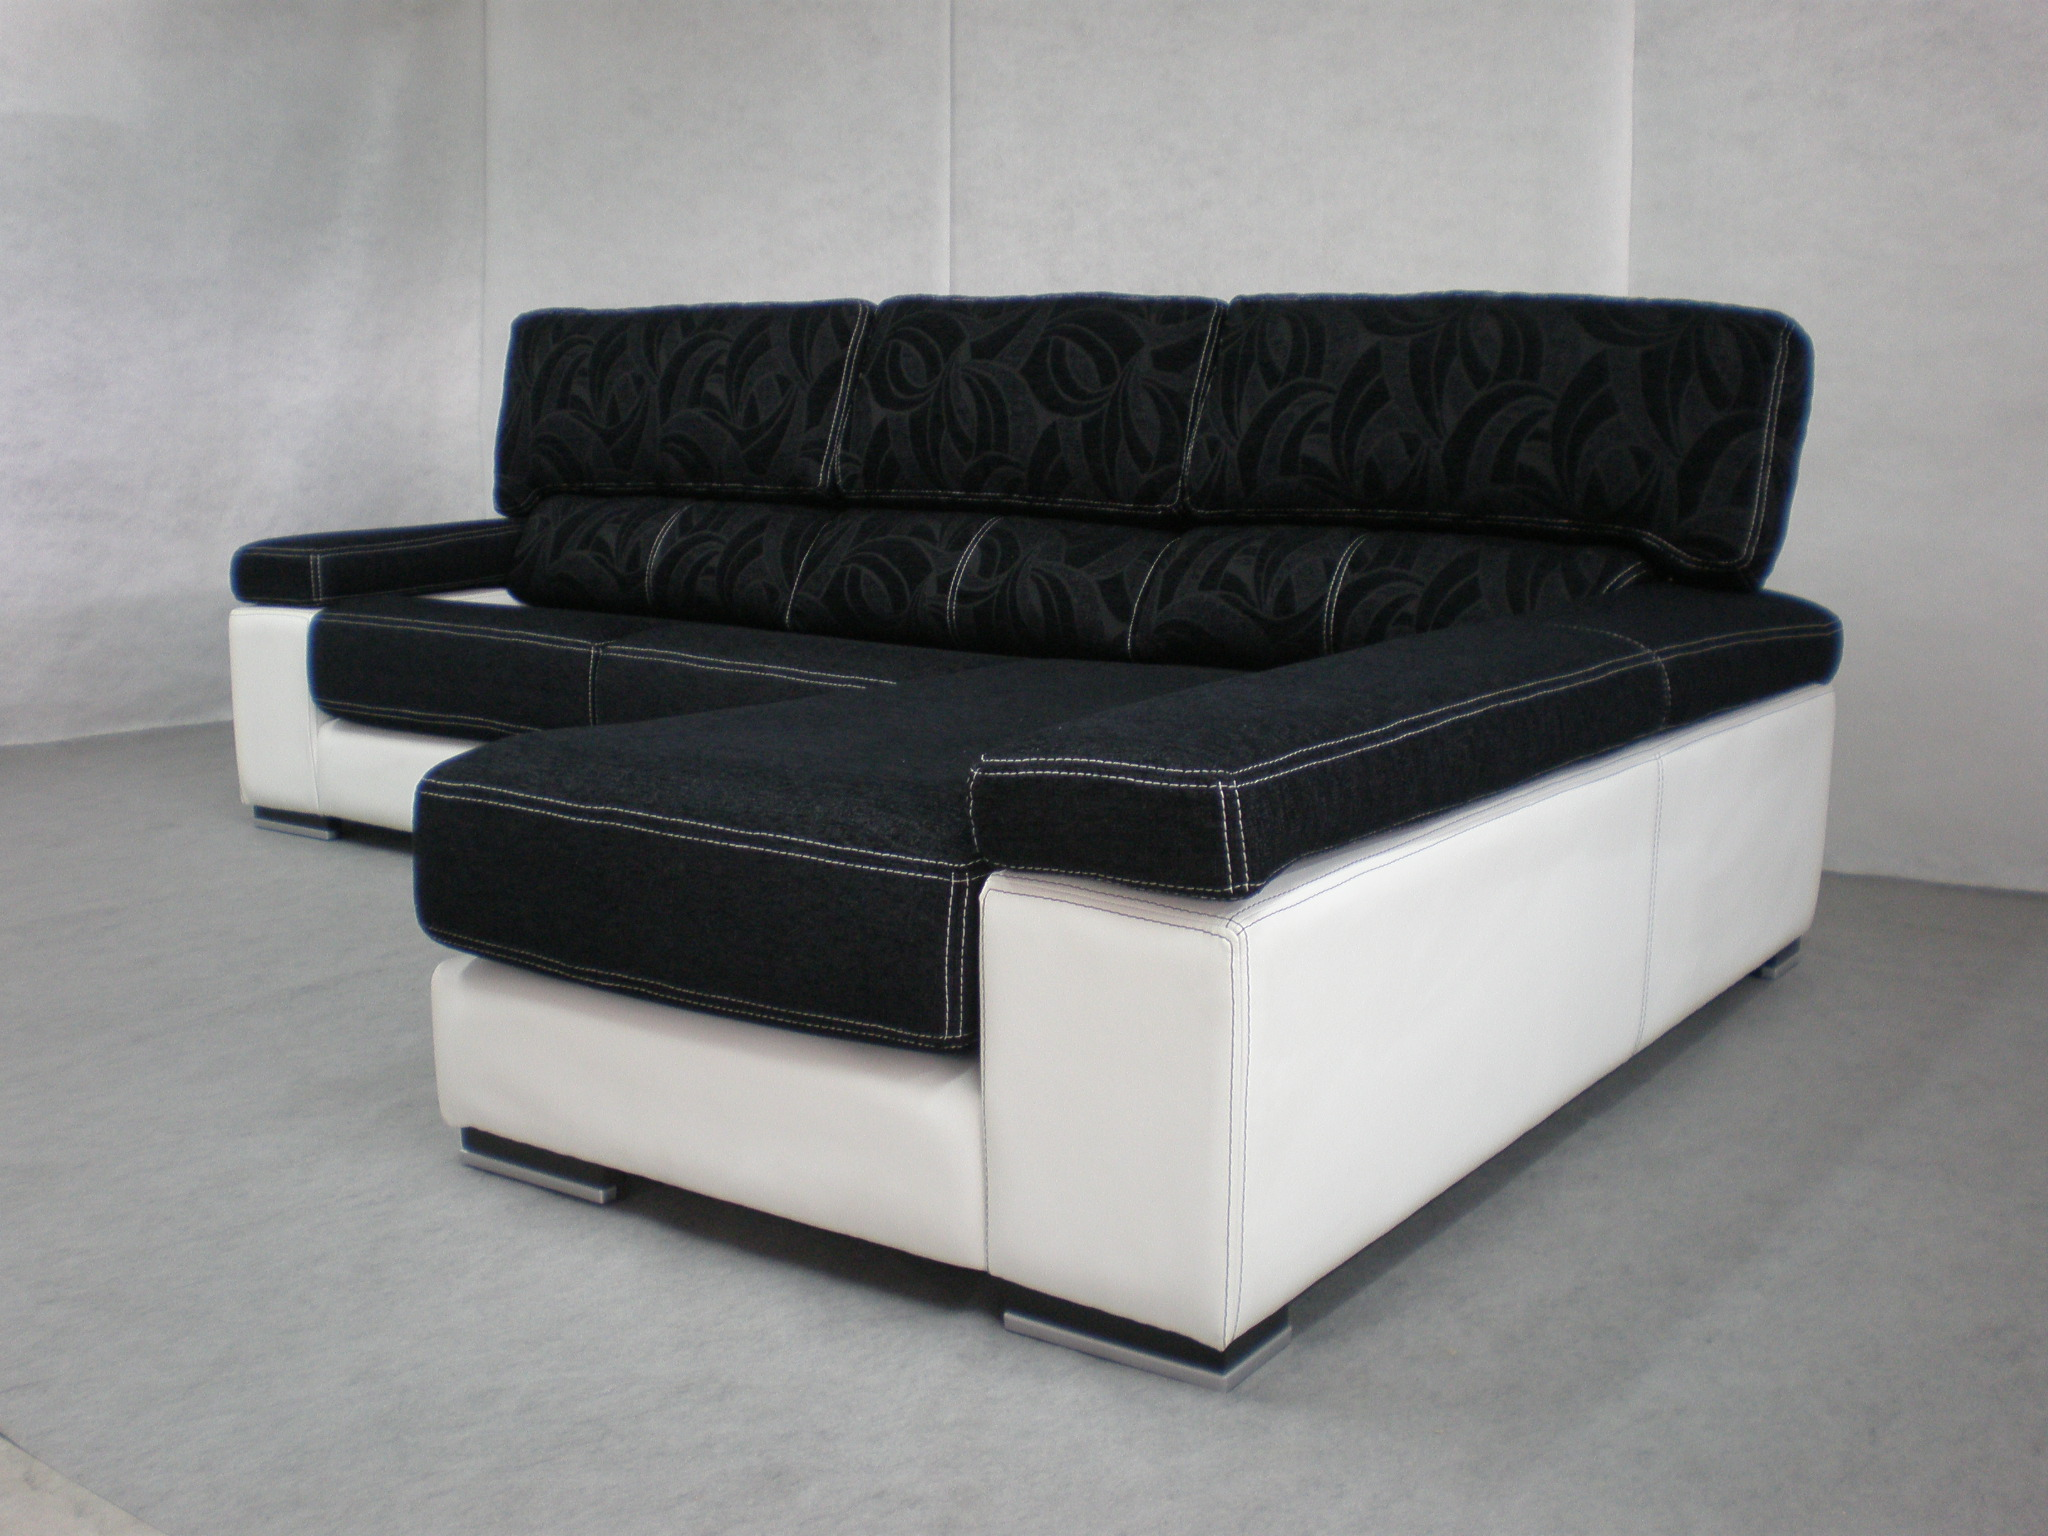 Sharon el m s vendido - Sofa blanco polipiel ...